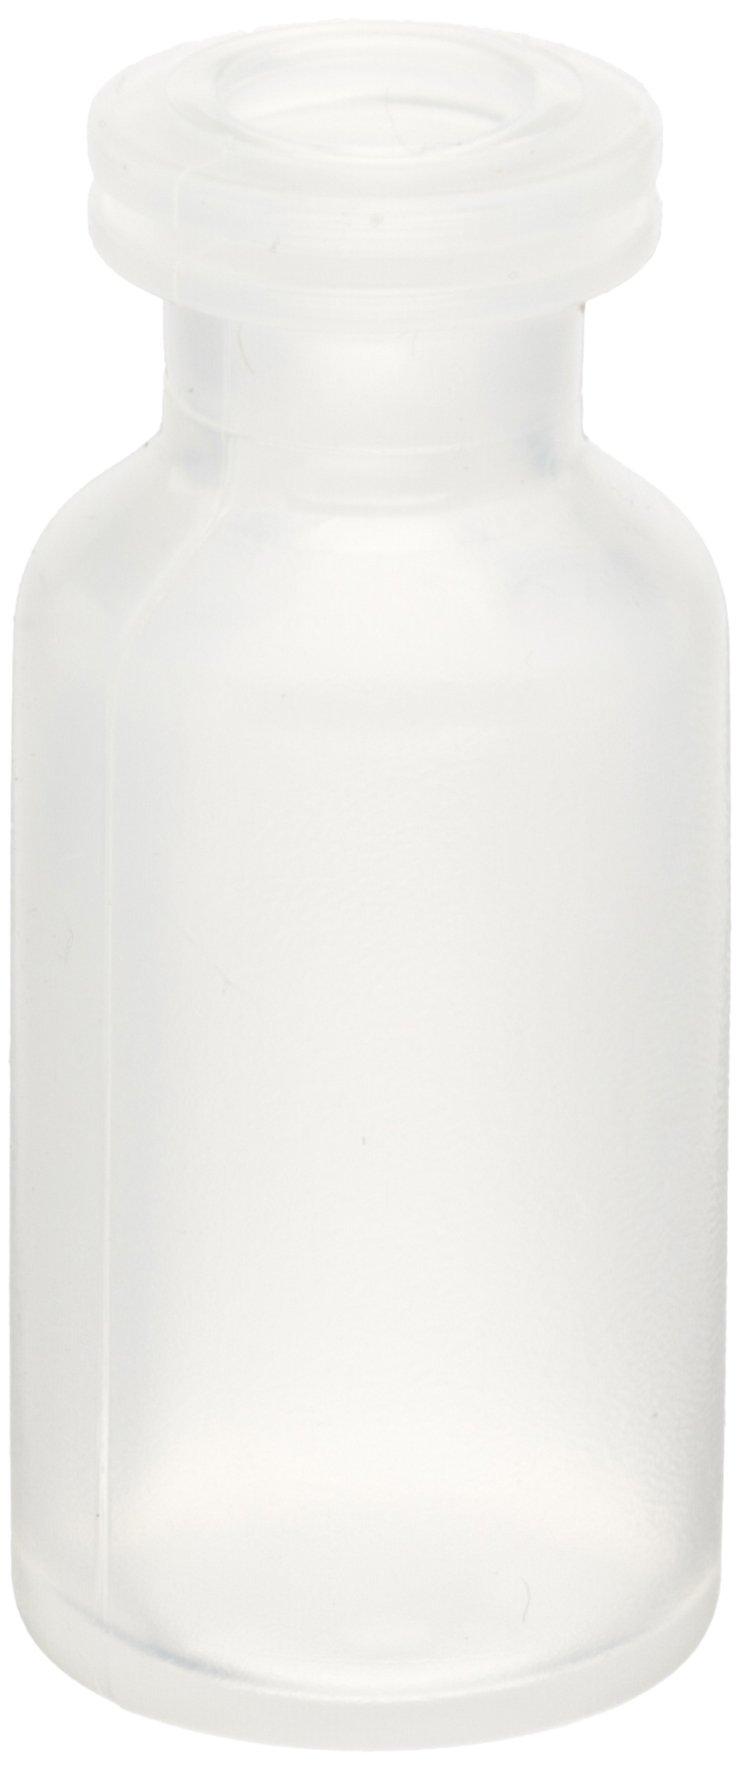 Wheaton 224007 Polypropylene 3mL Serum Bottle (Case of 500)